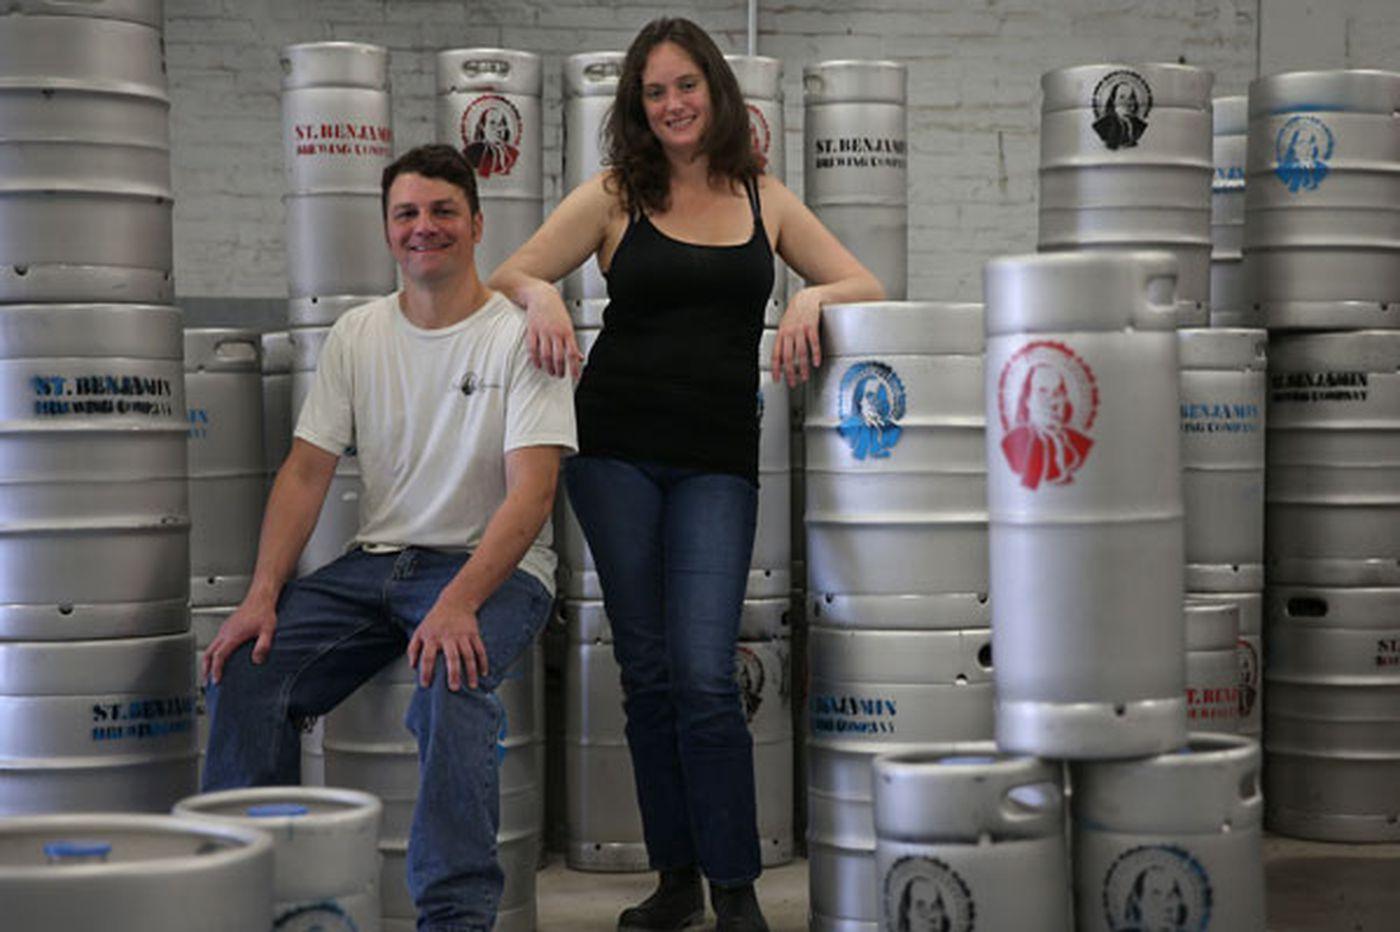 Saint Benjamin Brewing Co. closing in early May